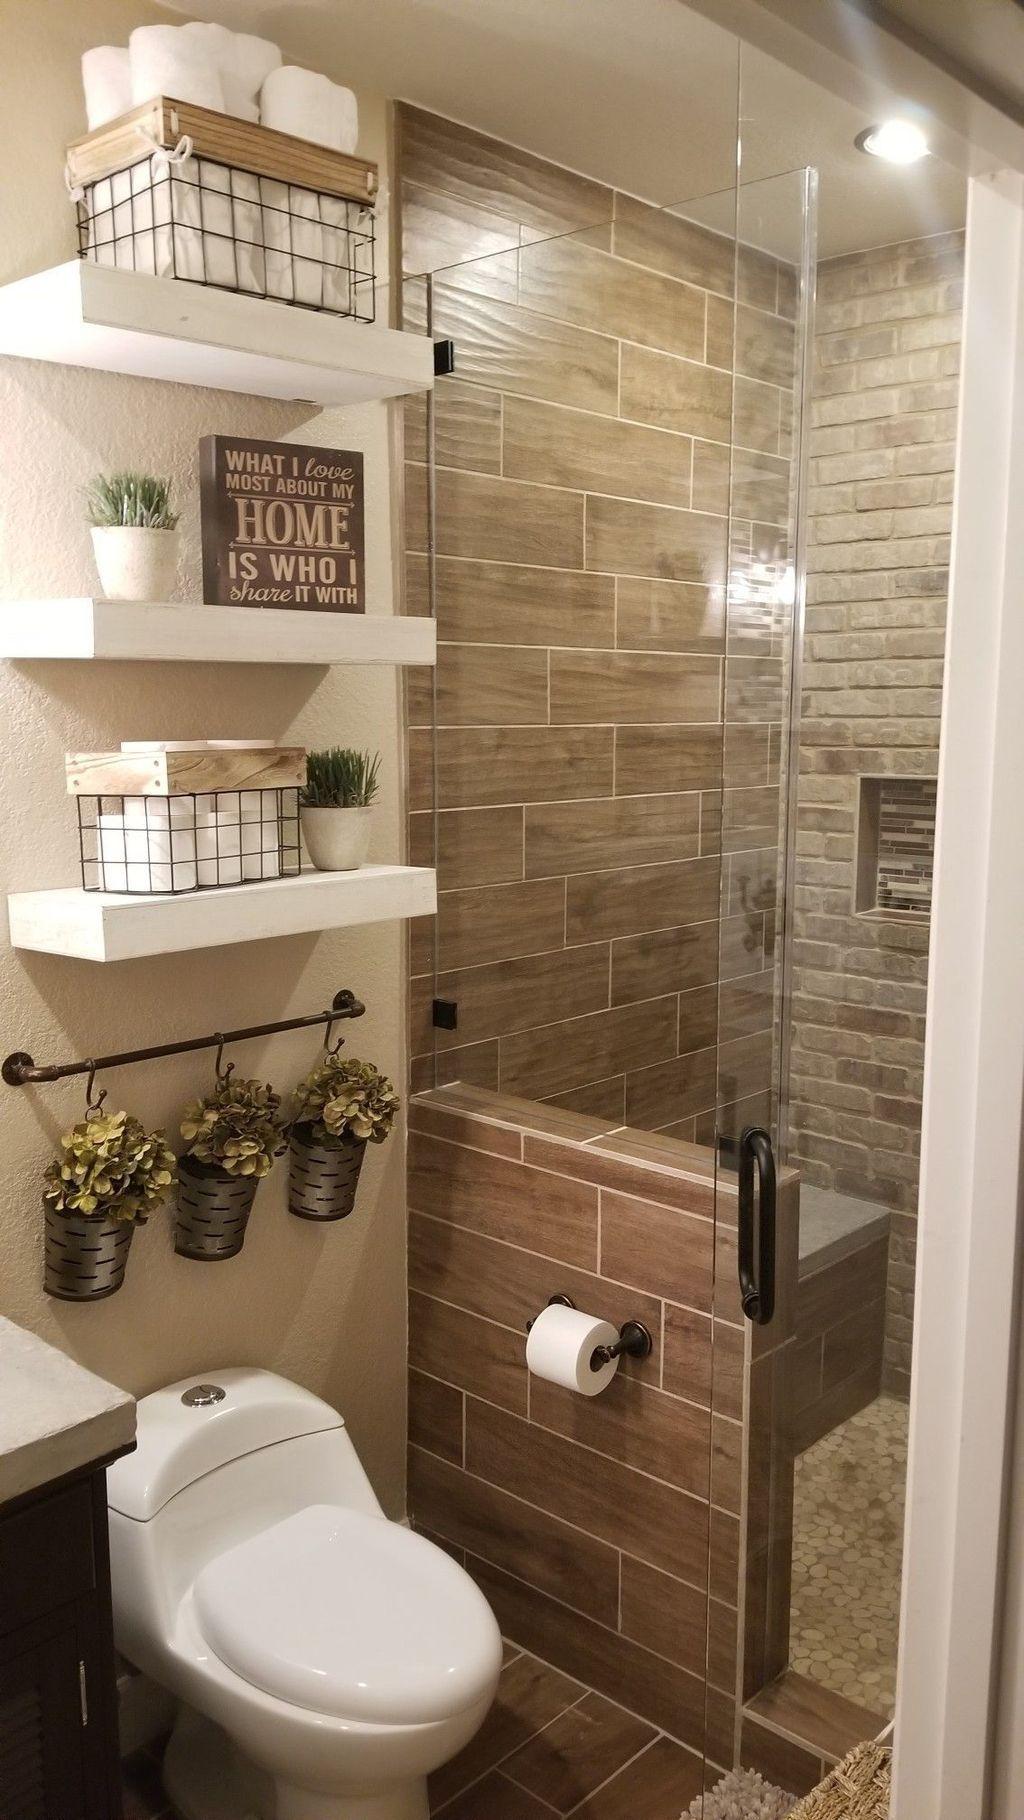 Amazing Small Bathroom Design Ideas In Apartment Small Bathroom Bathroom Design Small Bathrooms Remodel